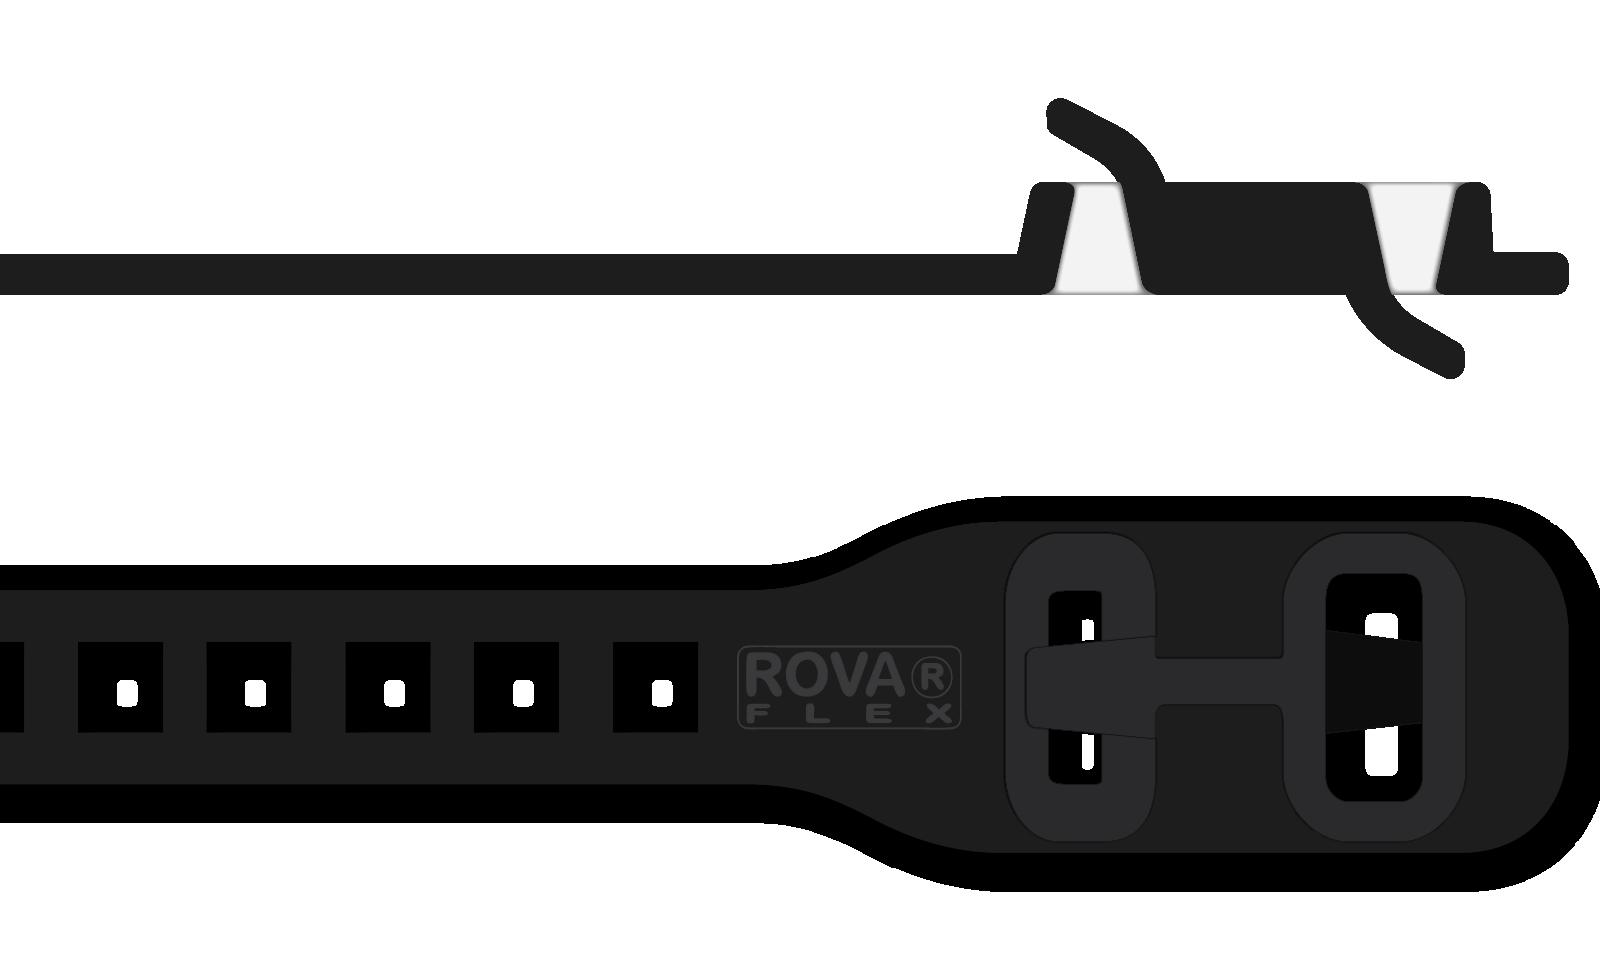 Rovaflex-Softbinder